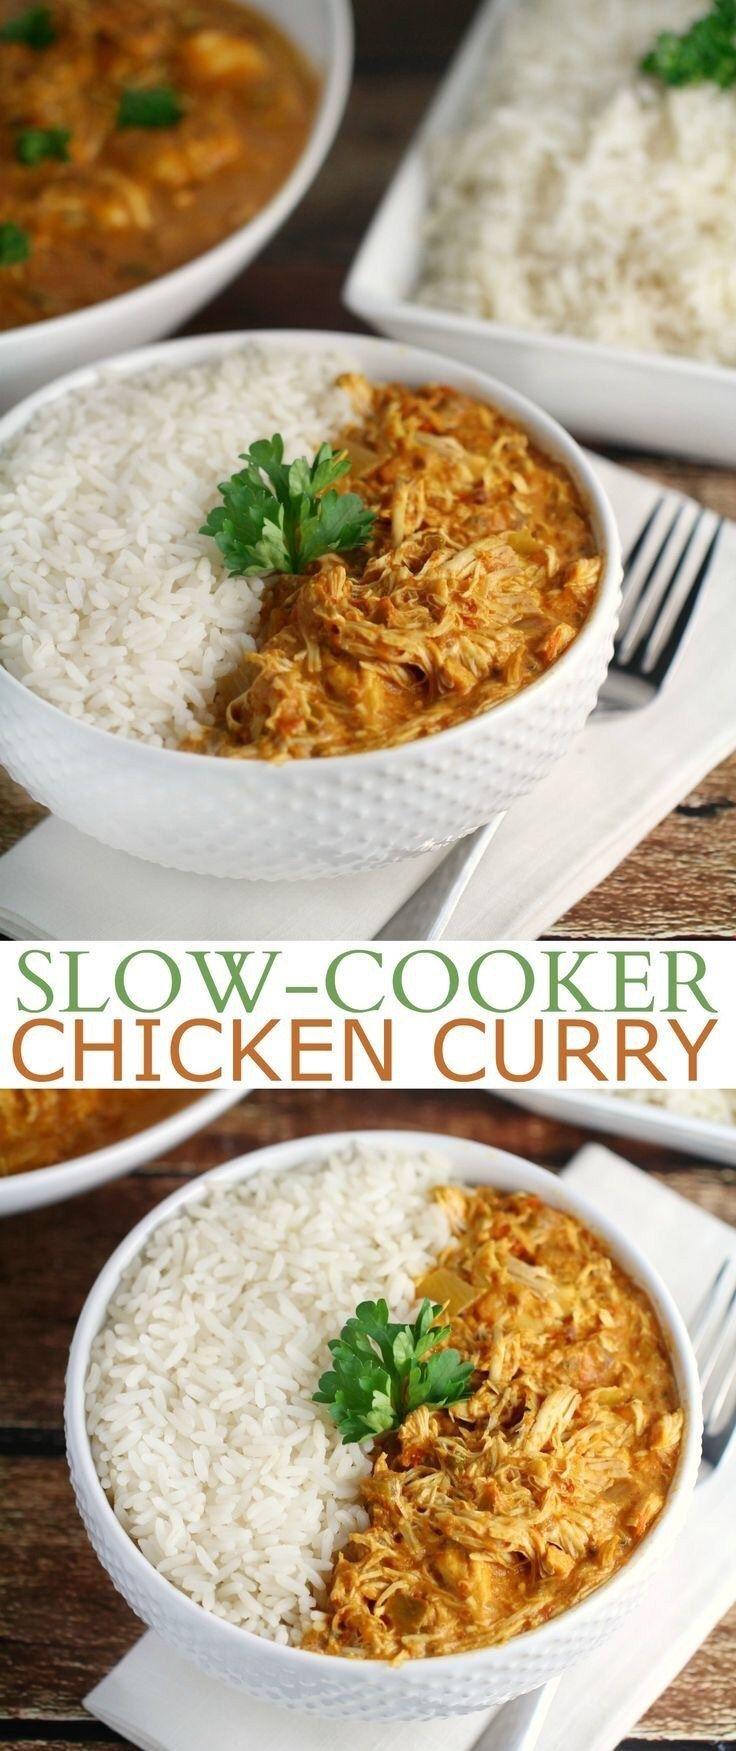 27 Healthy Crockpot Recipes -   13 healthy recipes Chicken curry ideas